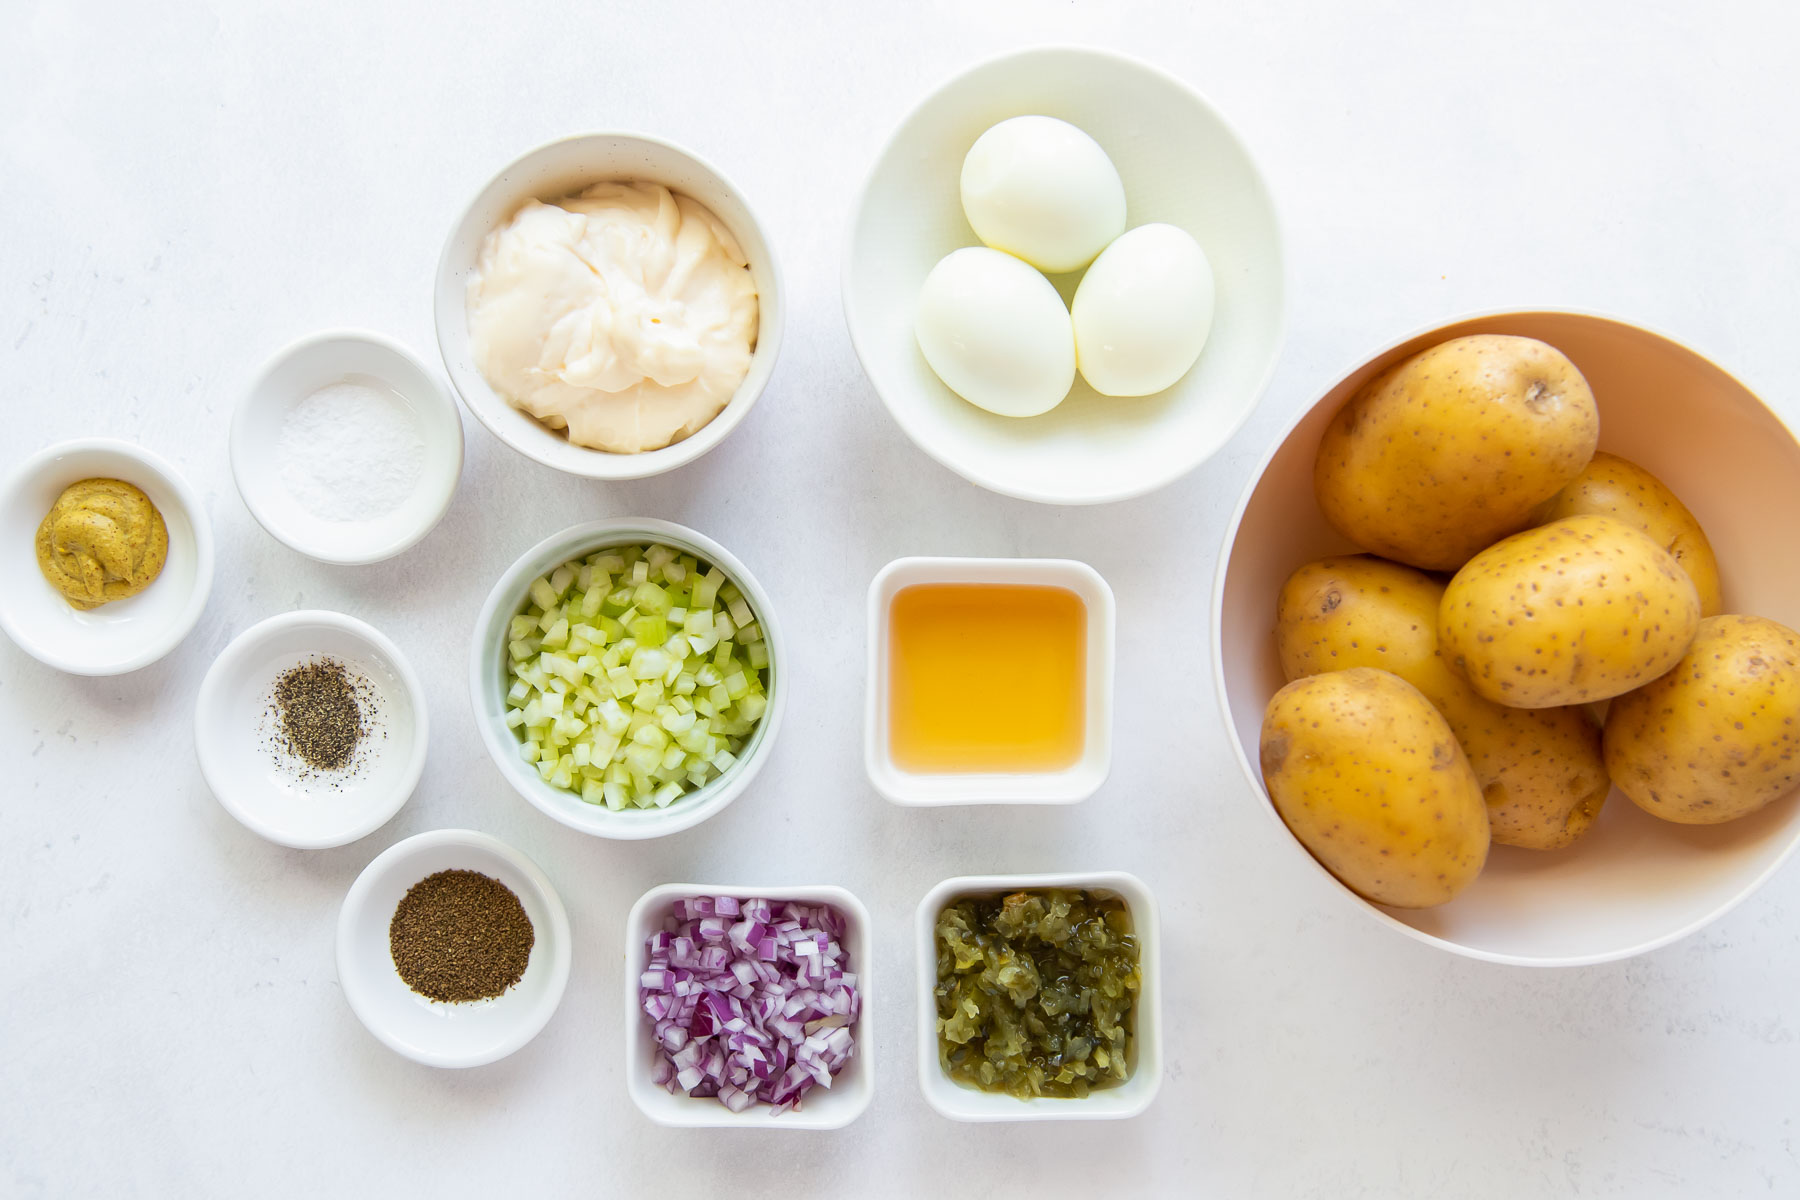 ingredients for potato salad recipe